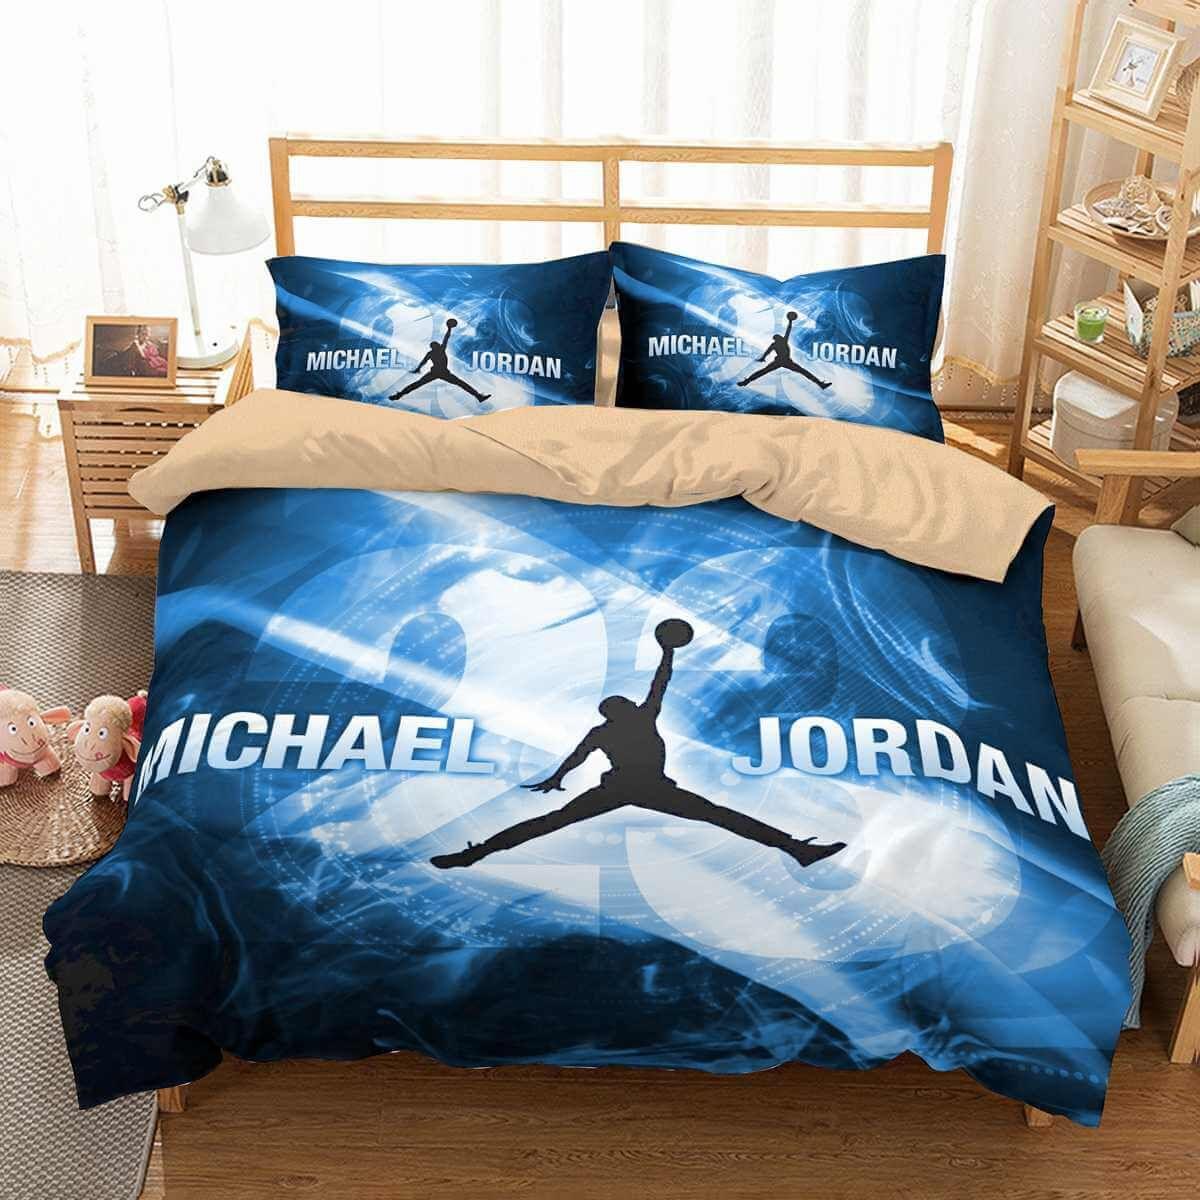 8D Customize Michael Jordan Bedding Set Duvet Cover Set Bedroom